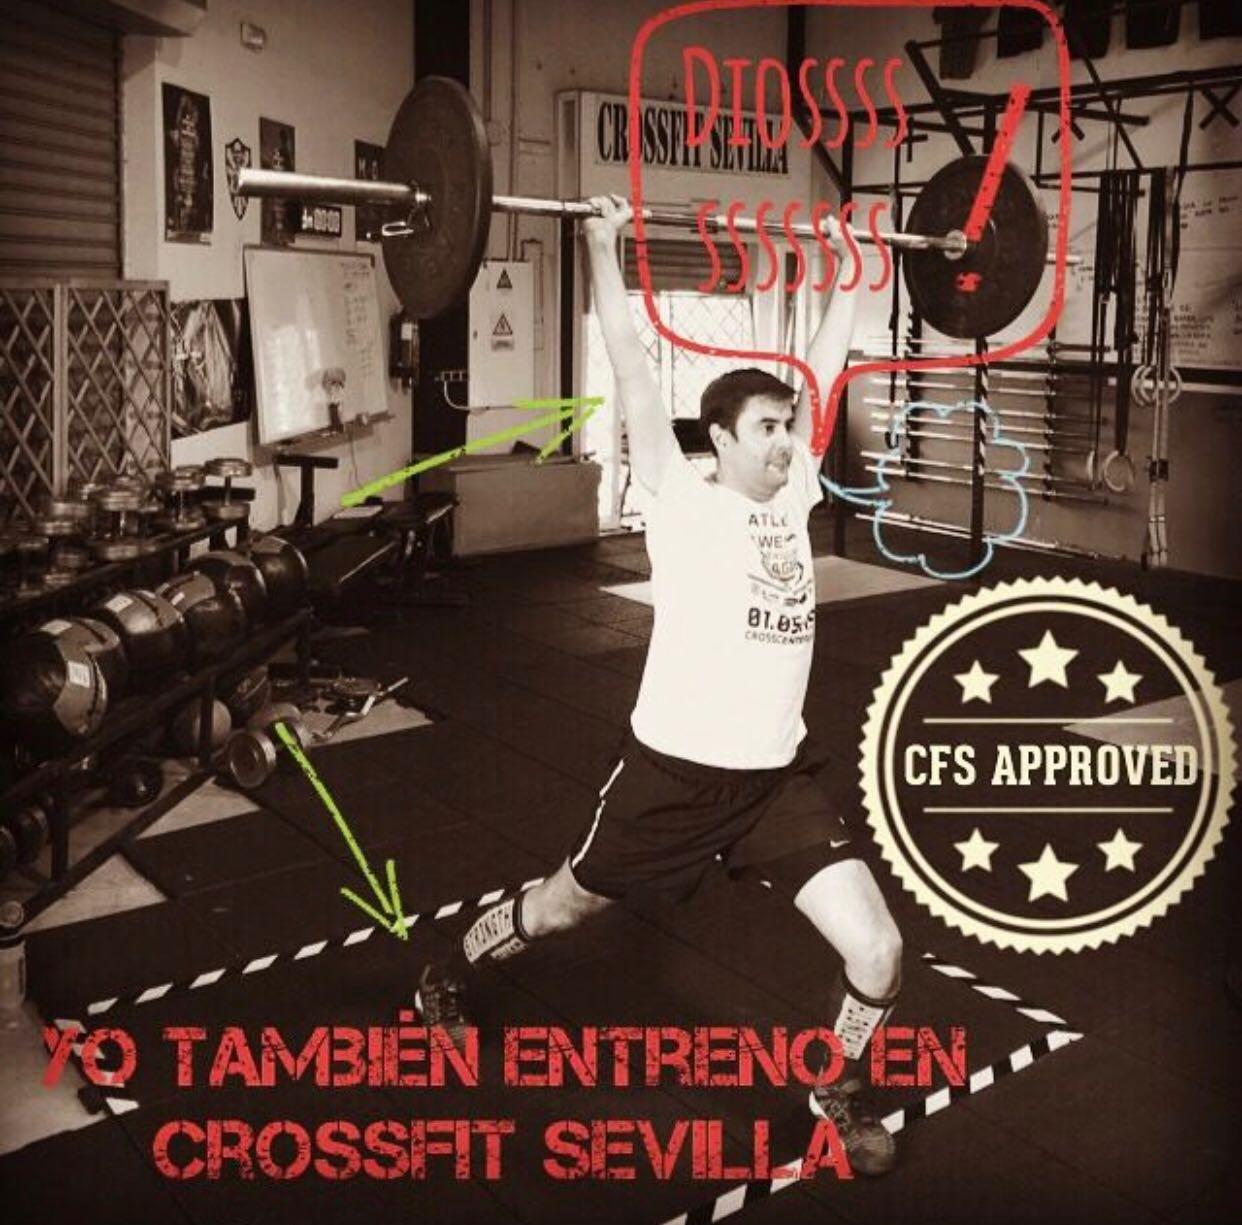 wod CFS Box CrossFit Sevilla training Halterofilia aprobado